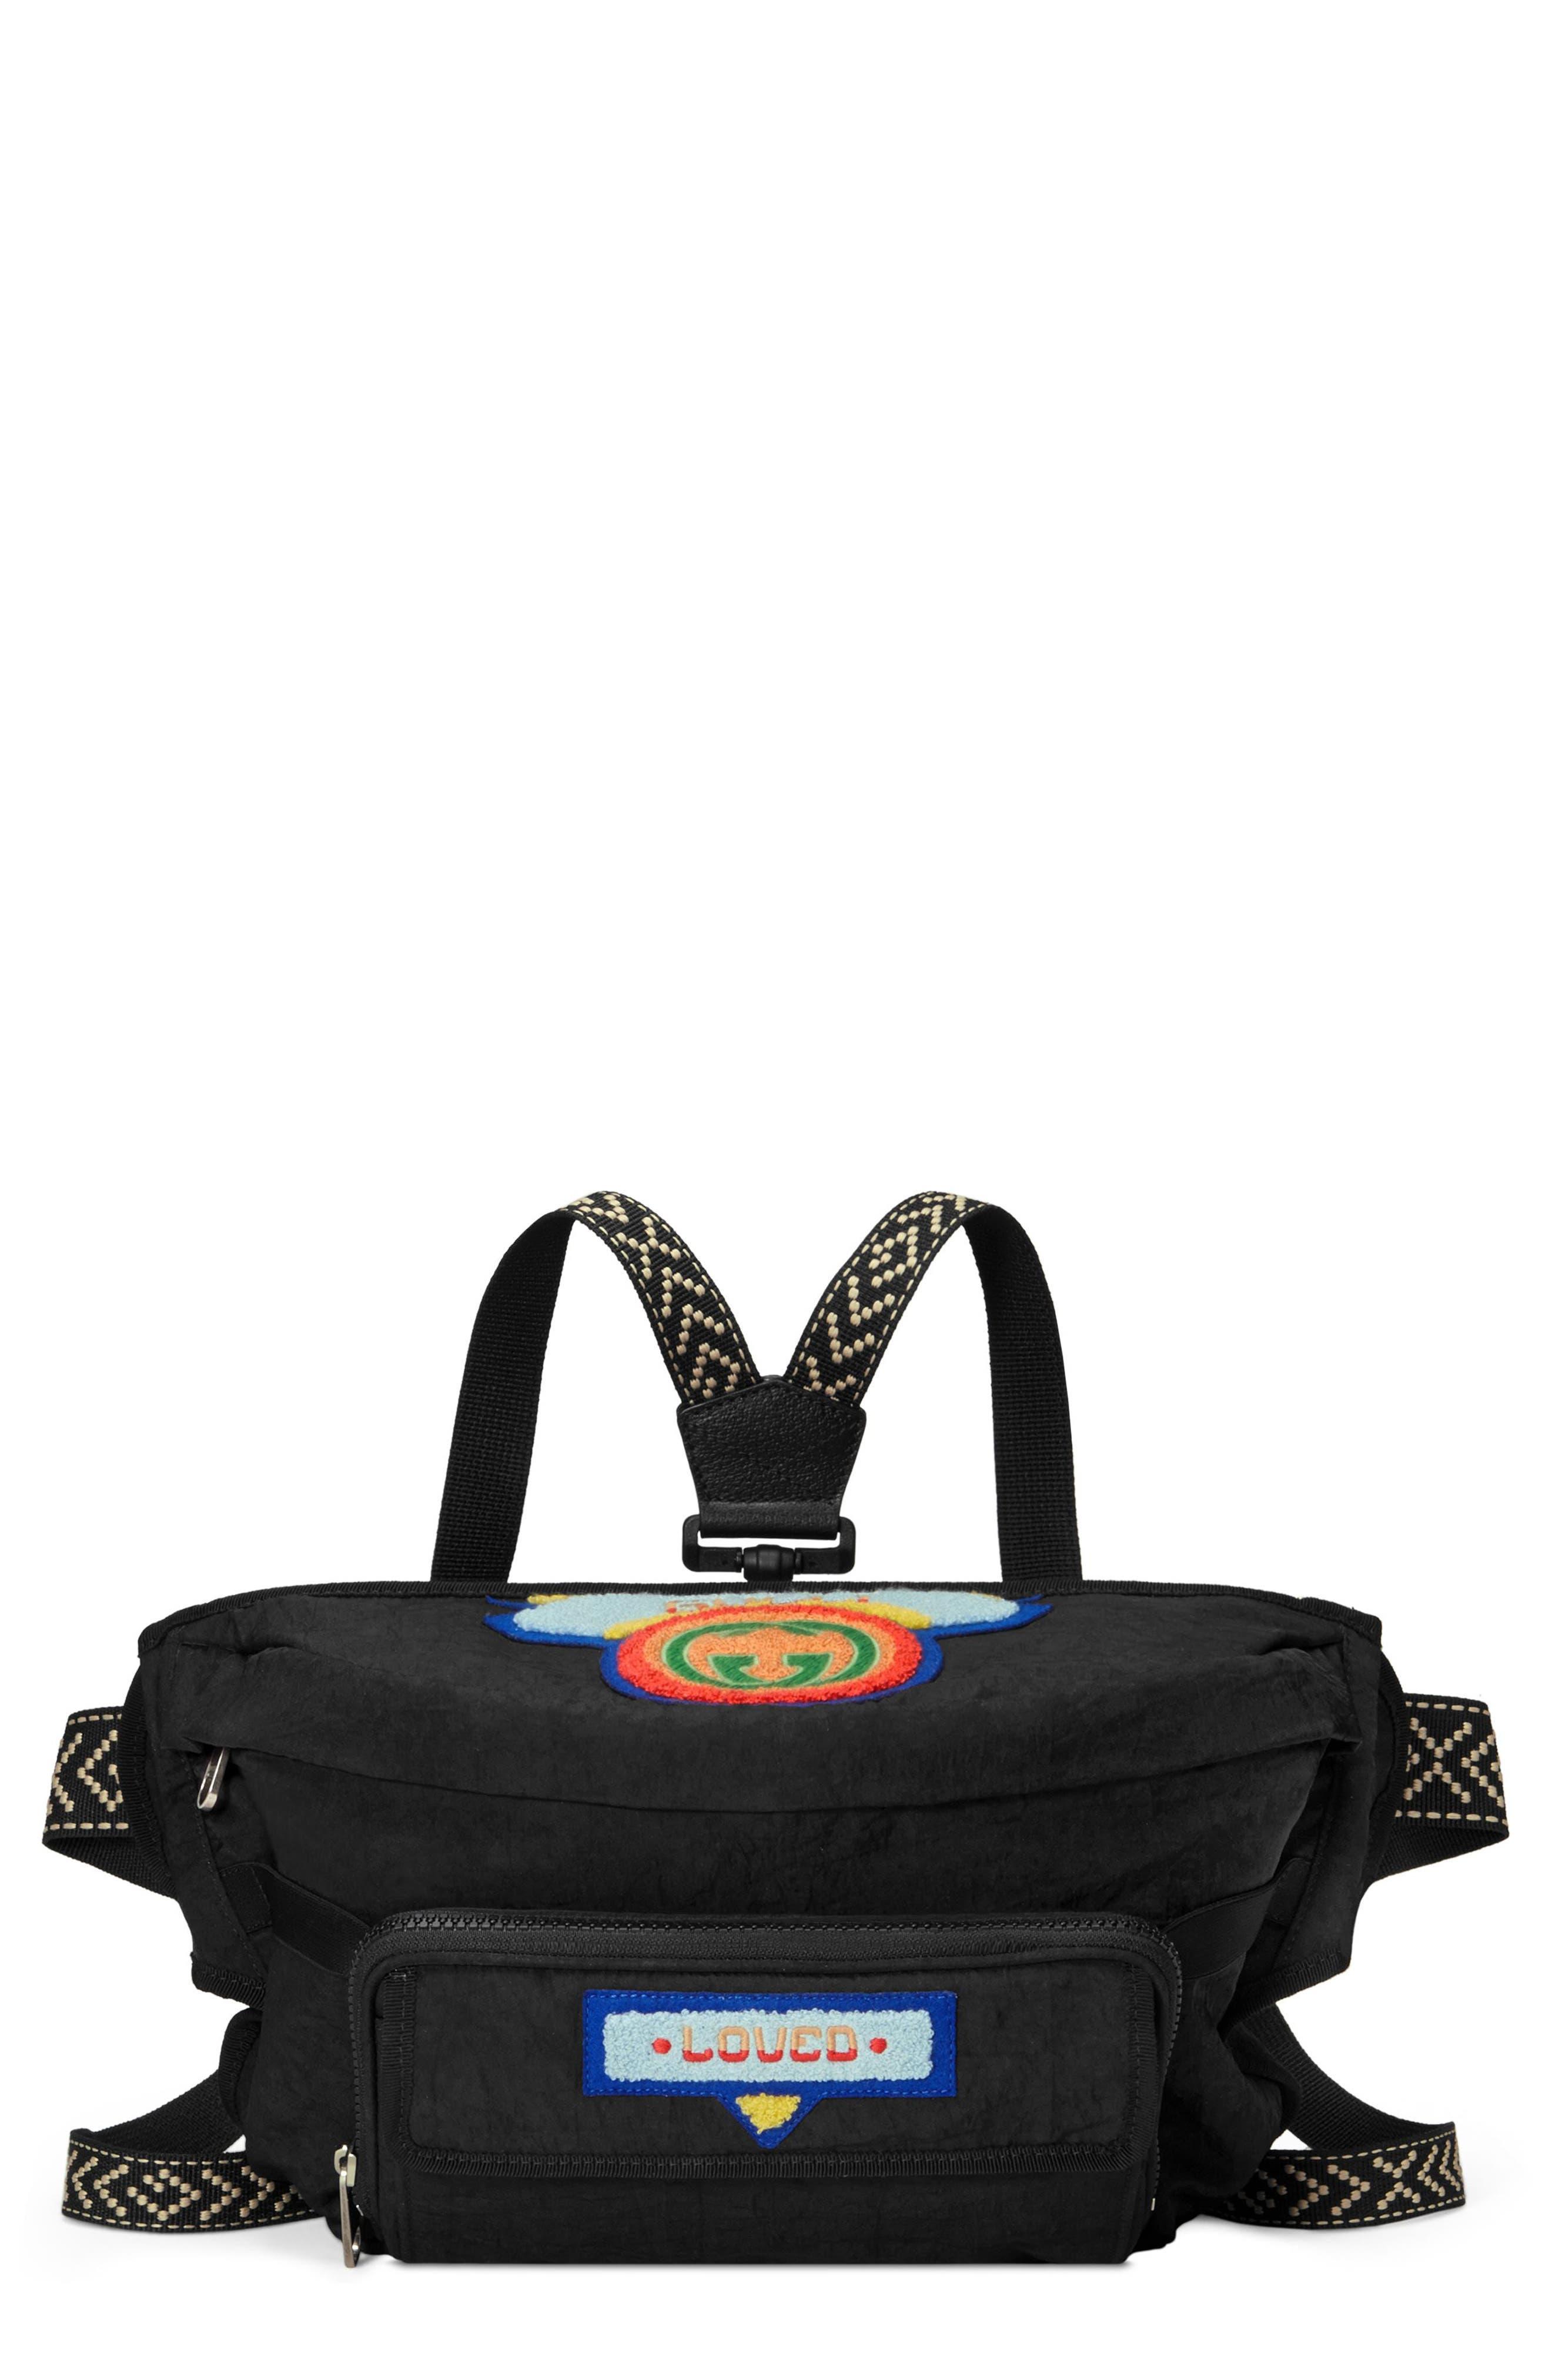 Patch Waist Pack,                         Main,                         color, Black